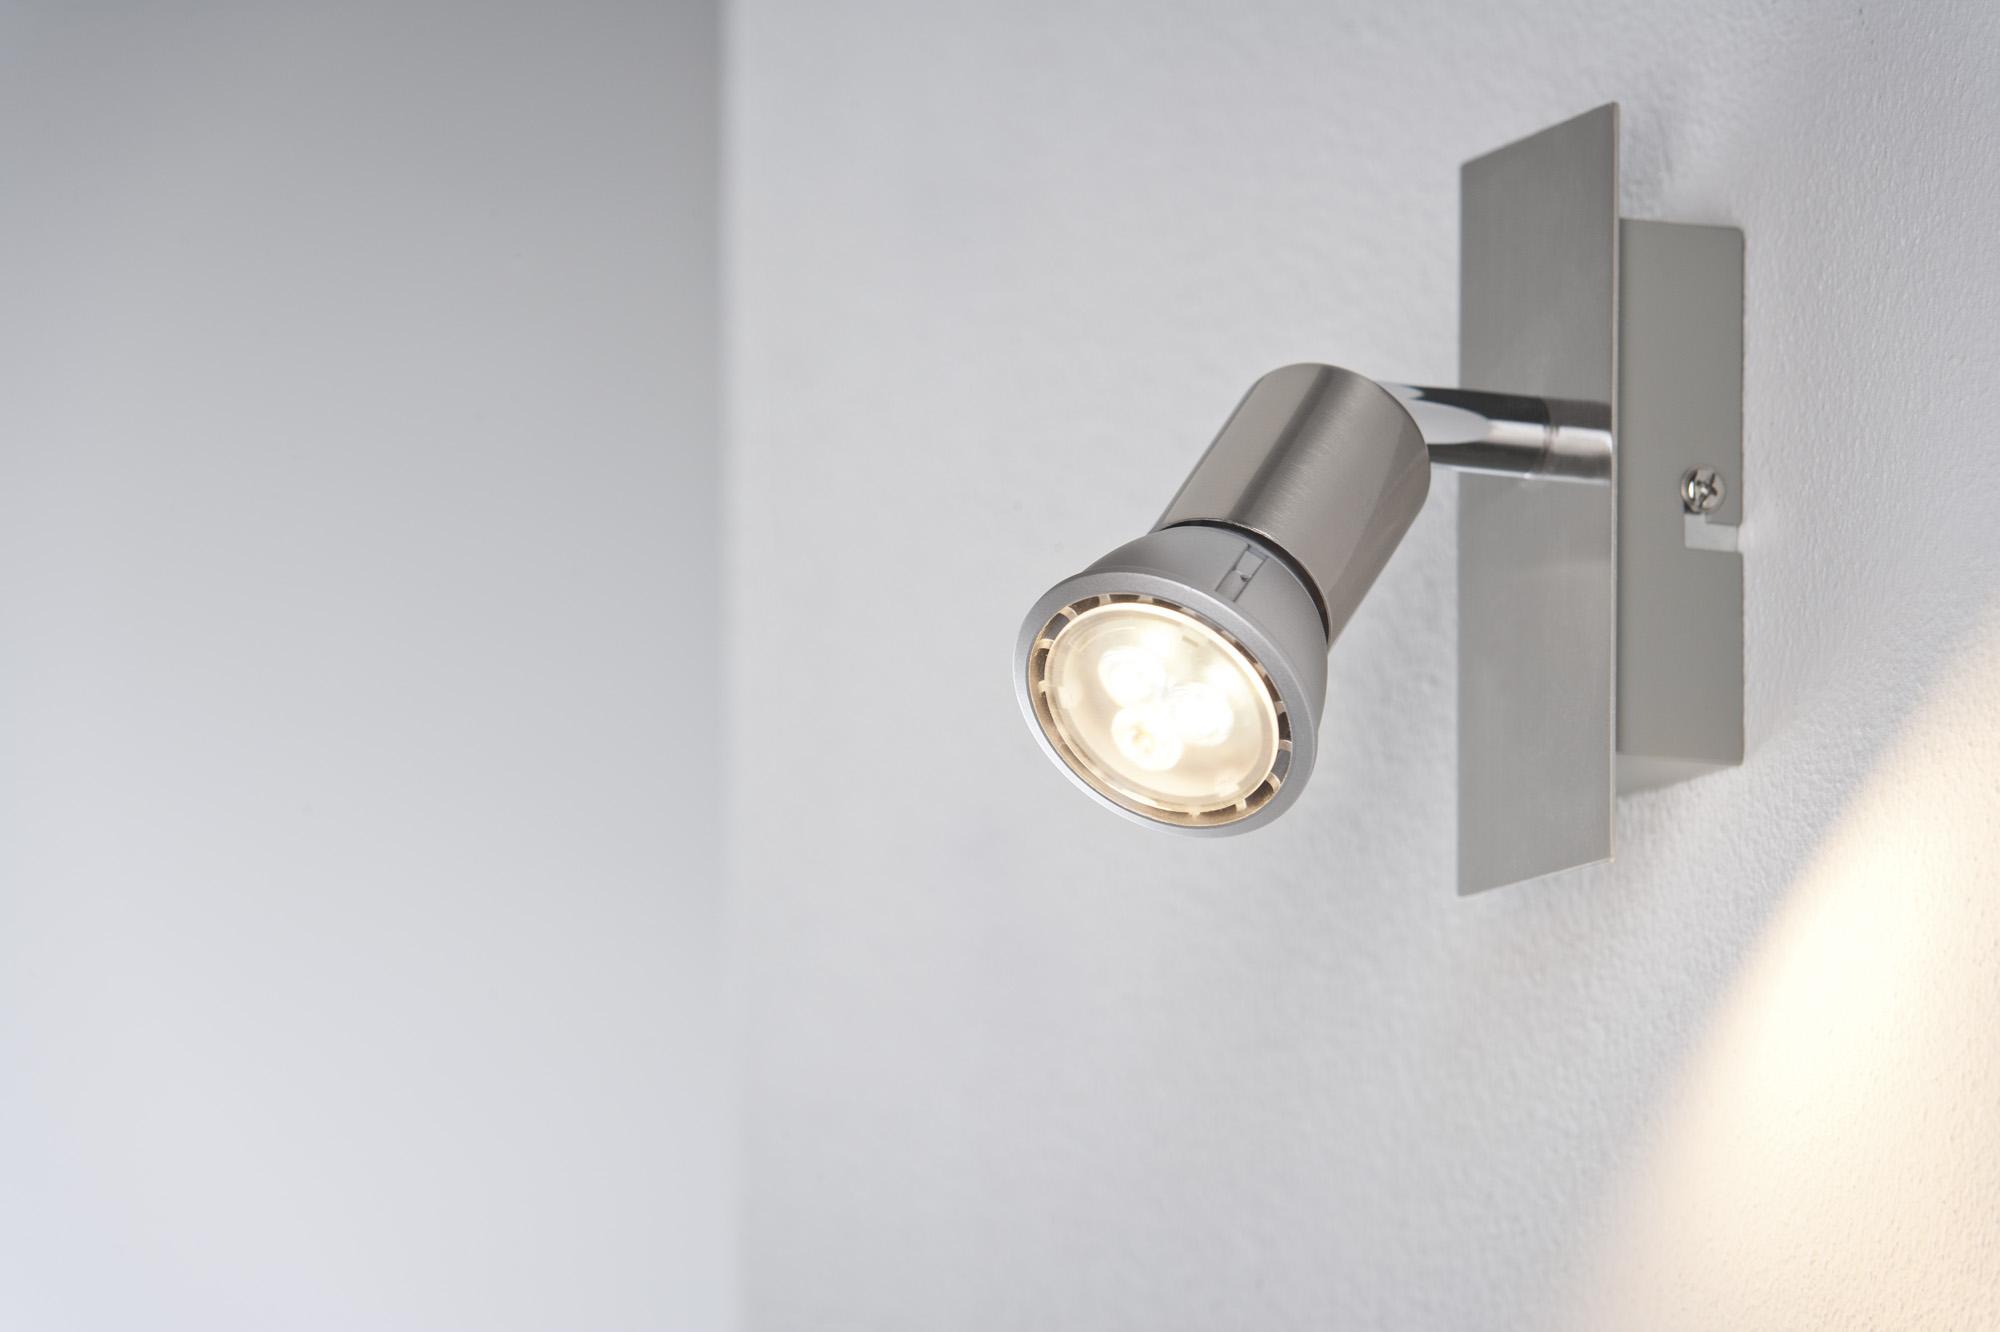 ampoule led gu10 230v 4w 35w blanc chaud 3 000k paulmann. Black Bedroom Furniture Sets. Home Design Ideas